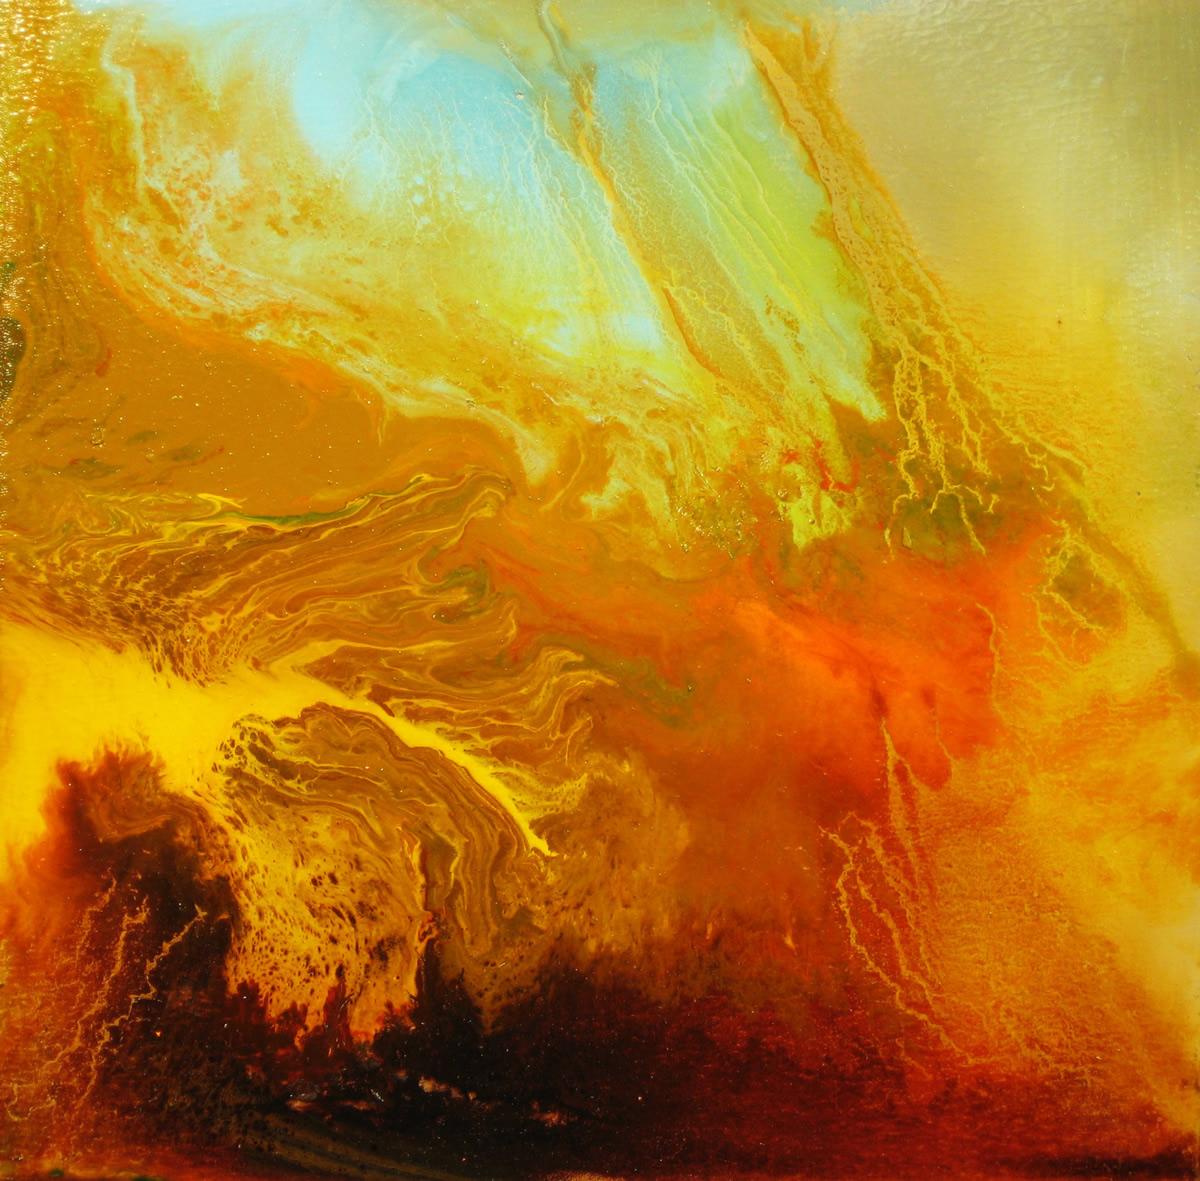 Maurice Sapiro - North Haven, CT artist